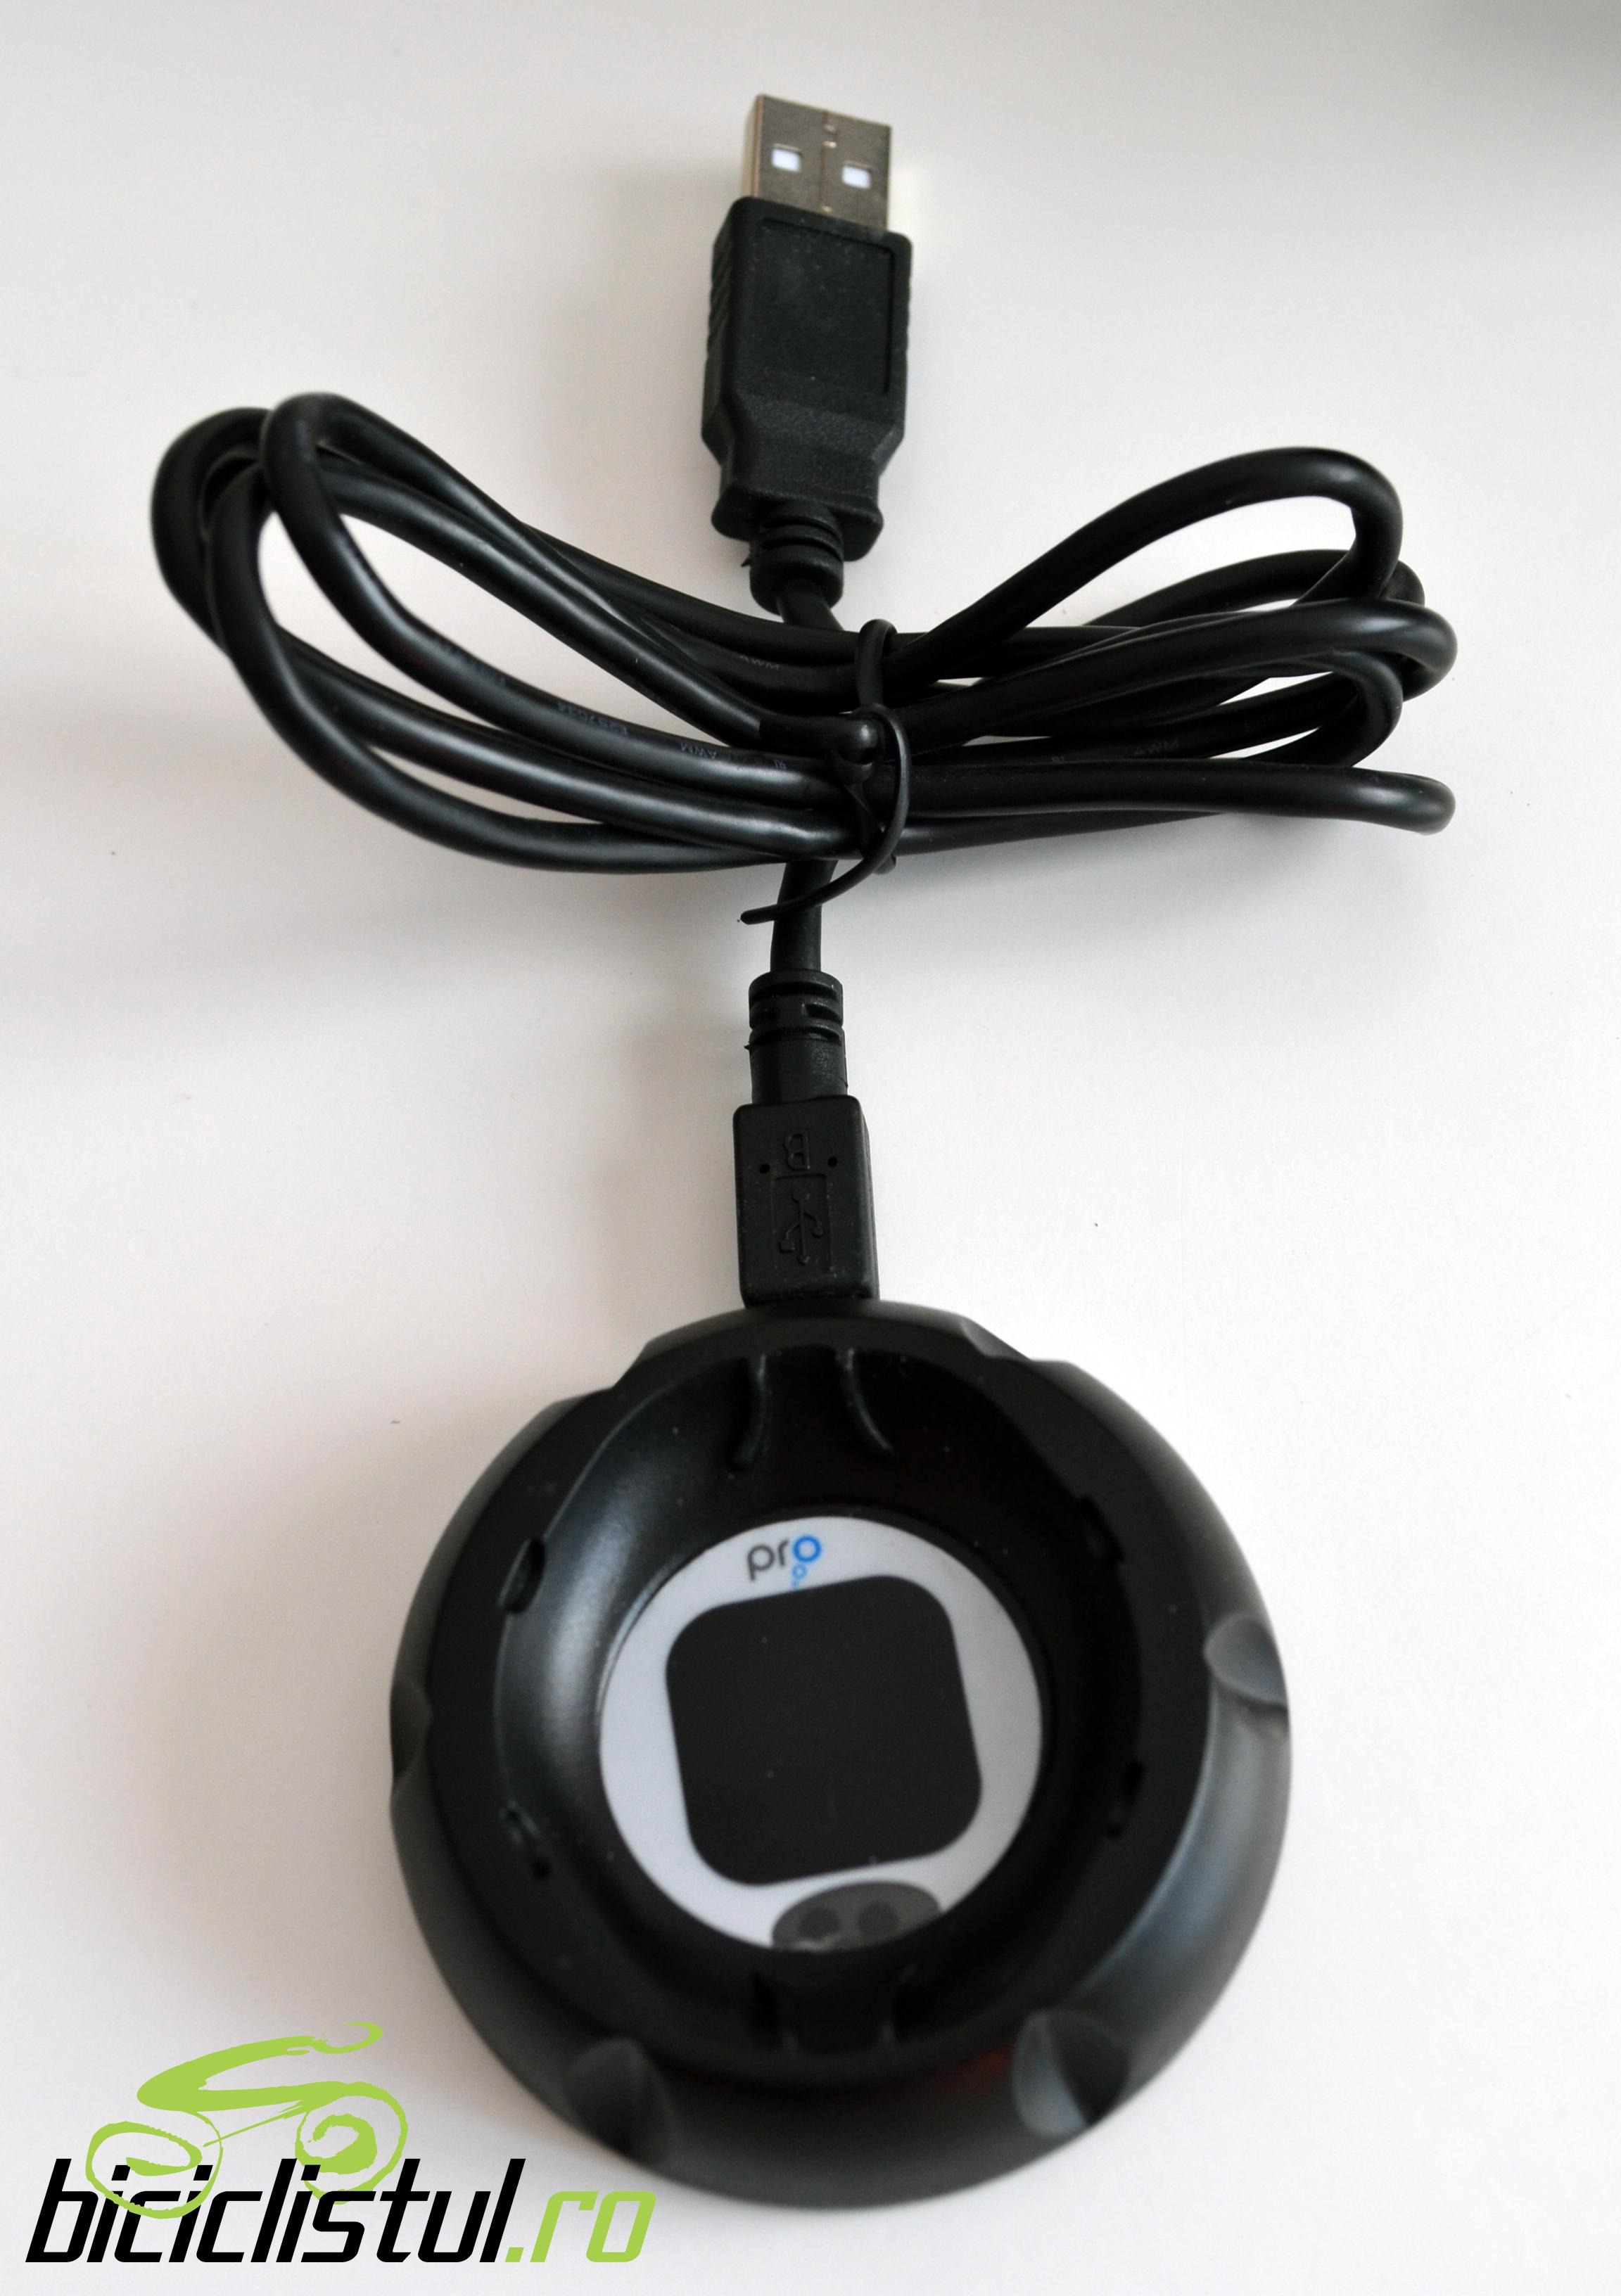 Swimovate Pool-Mate Pro dockstation conectat cu cablul